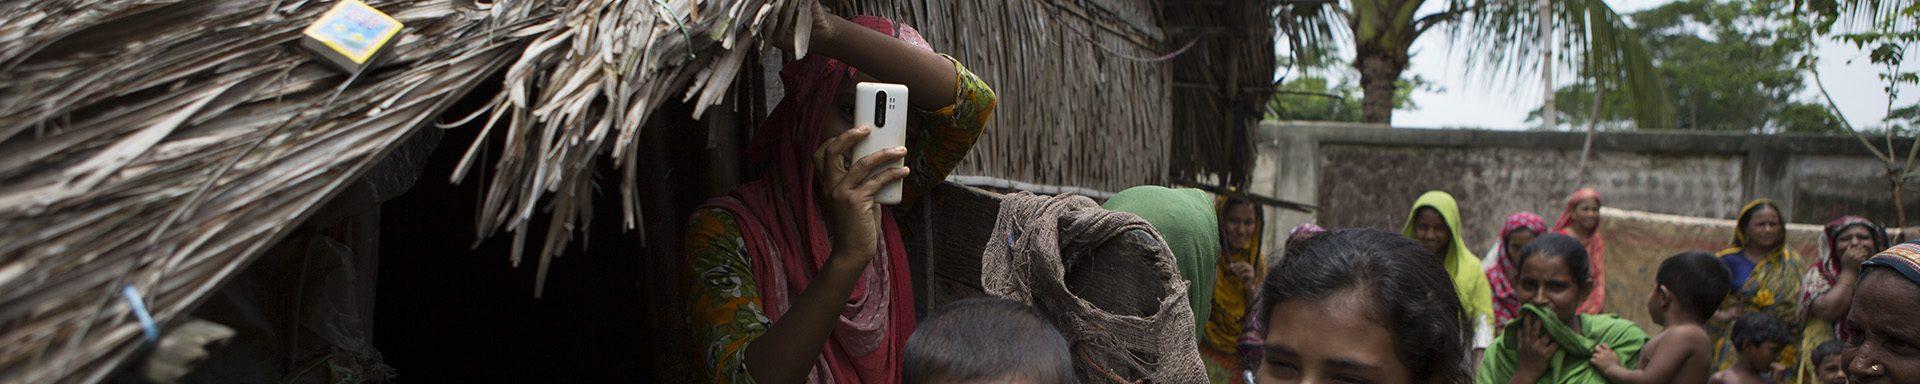 Bangladesh VK 249 ©Mike Roelofs